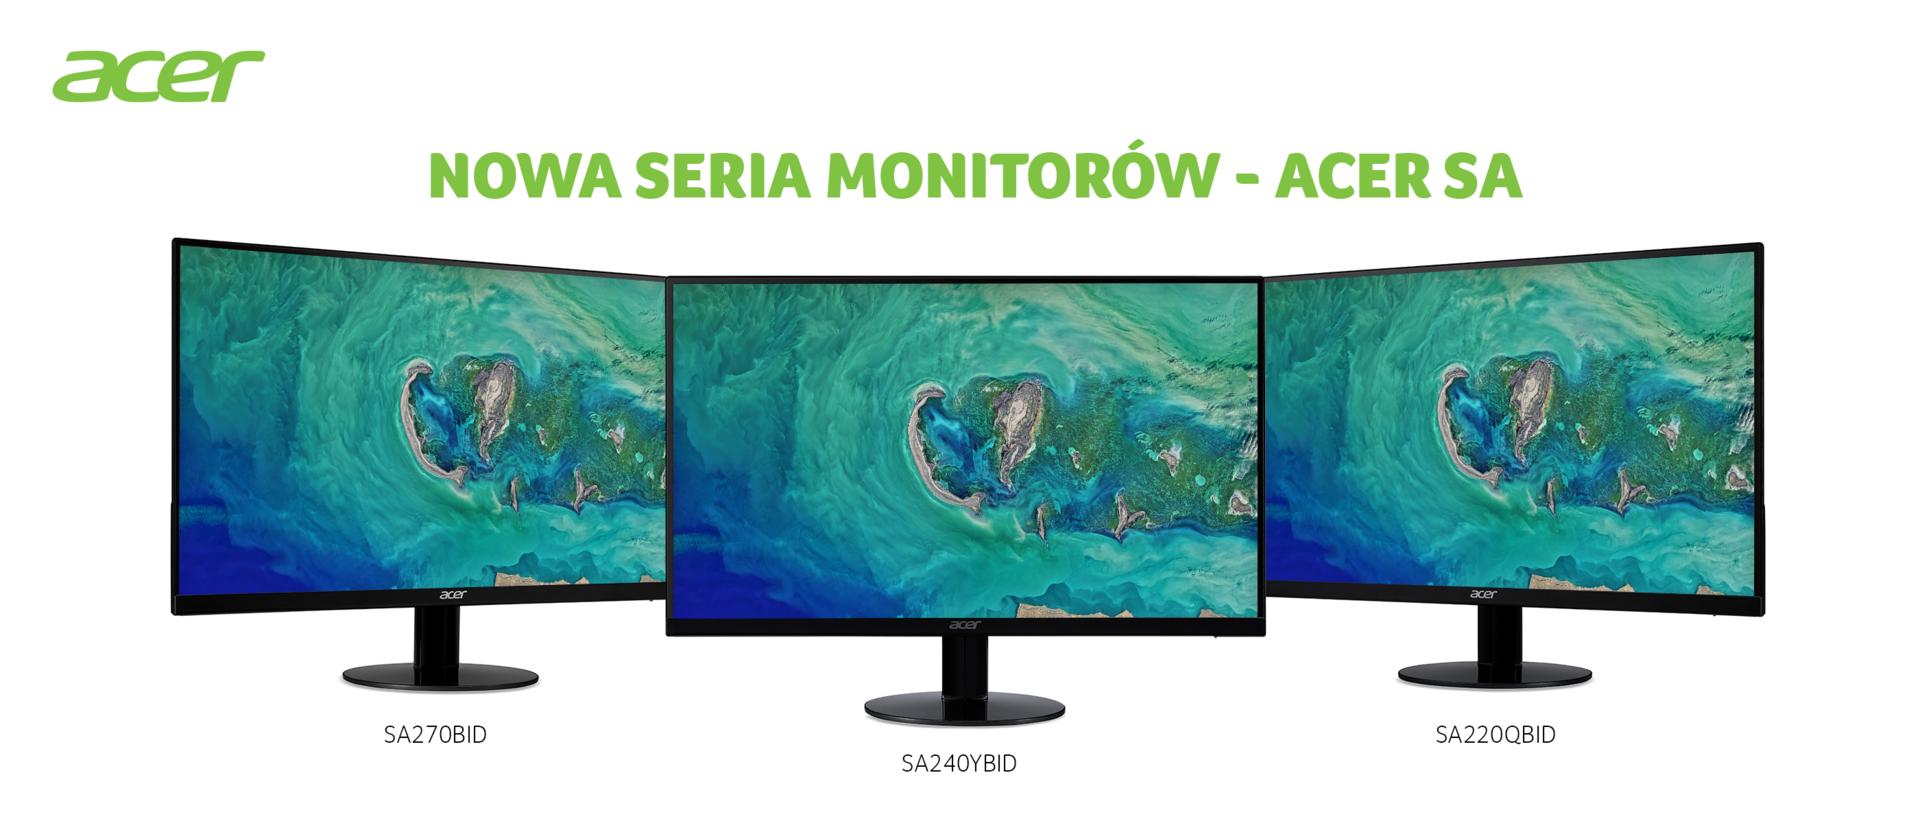 Acer prezentuje nowe ultrasmukłe monitory z serii SA